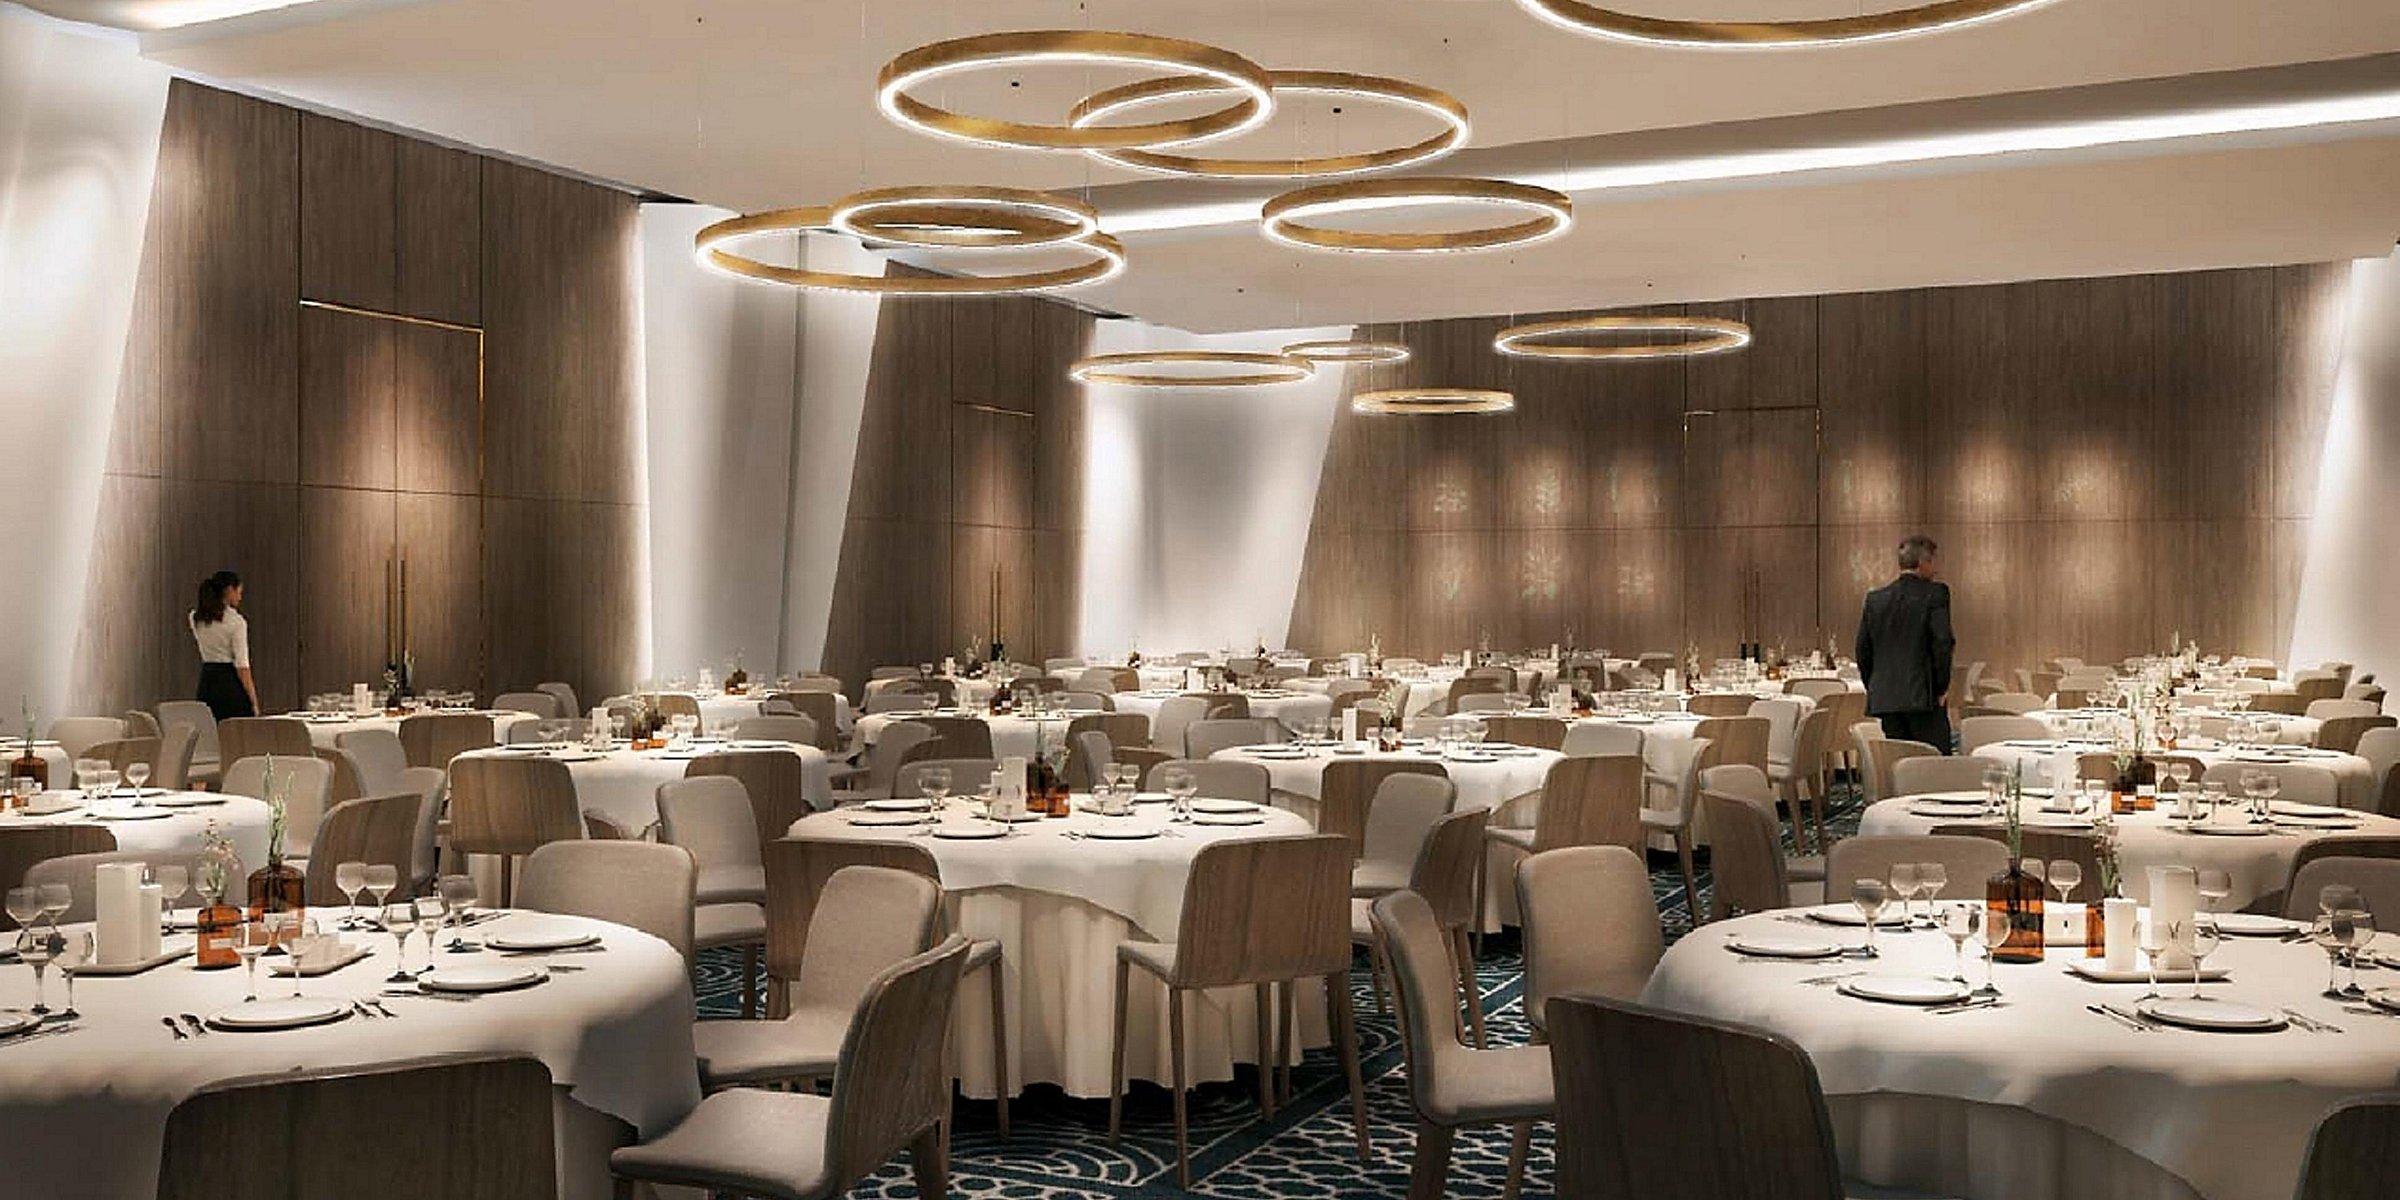 Intercontinental Lyon Hotel Dieu Hotel Meeting Rooms